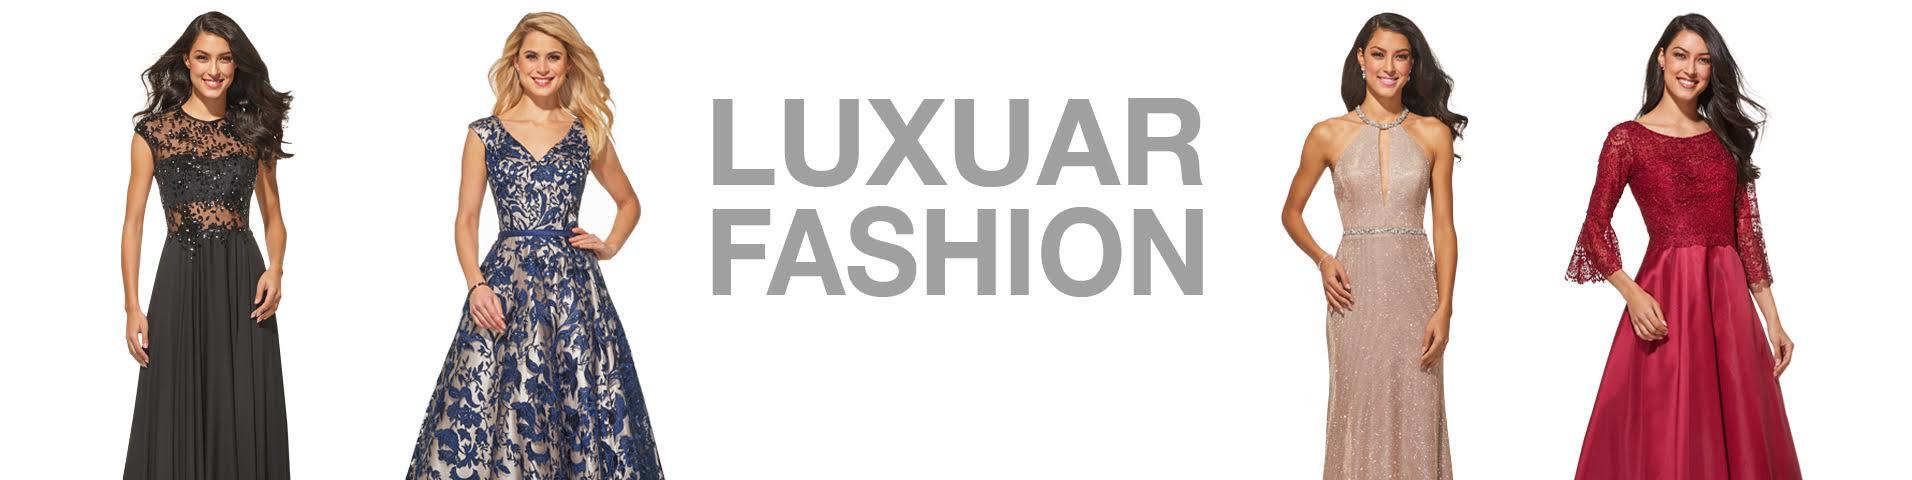 Robes Luxuar FashionAchat Sur En Zalando Ligne rdBxWCQoe